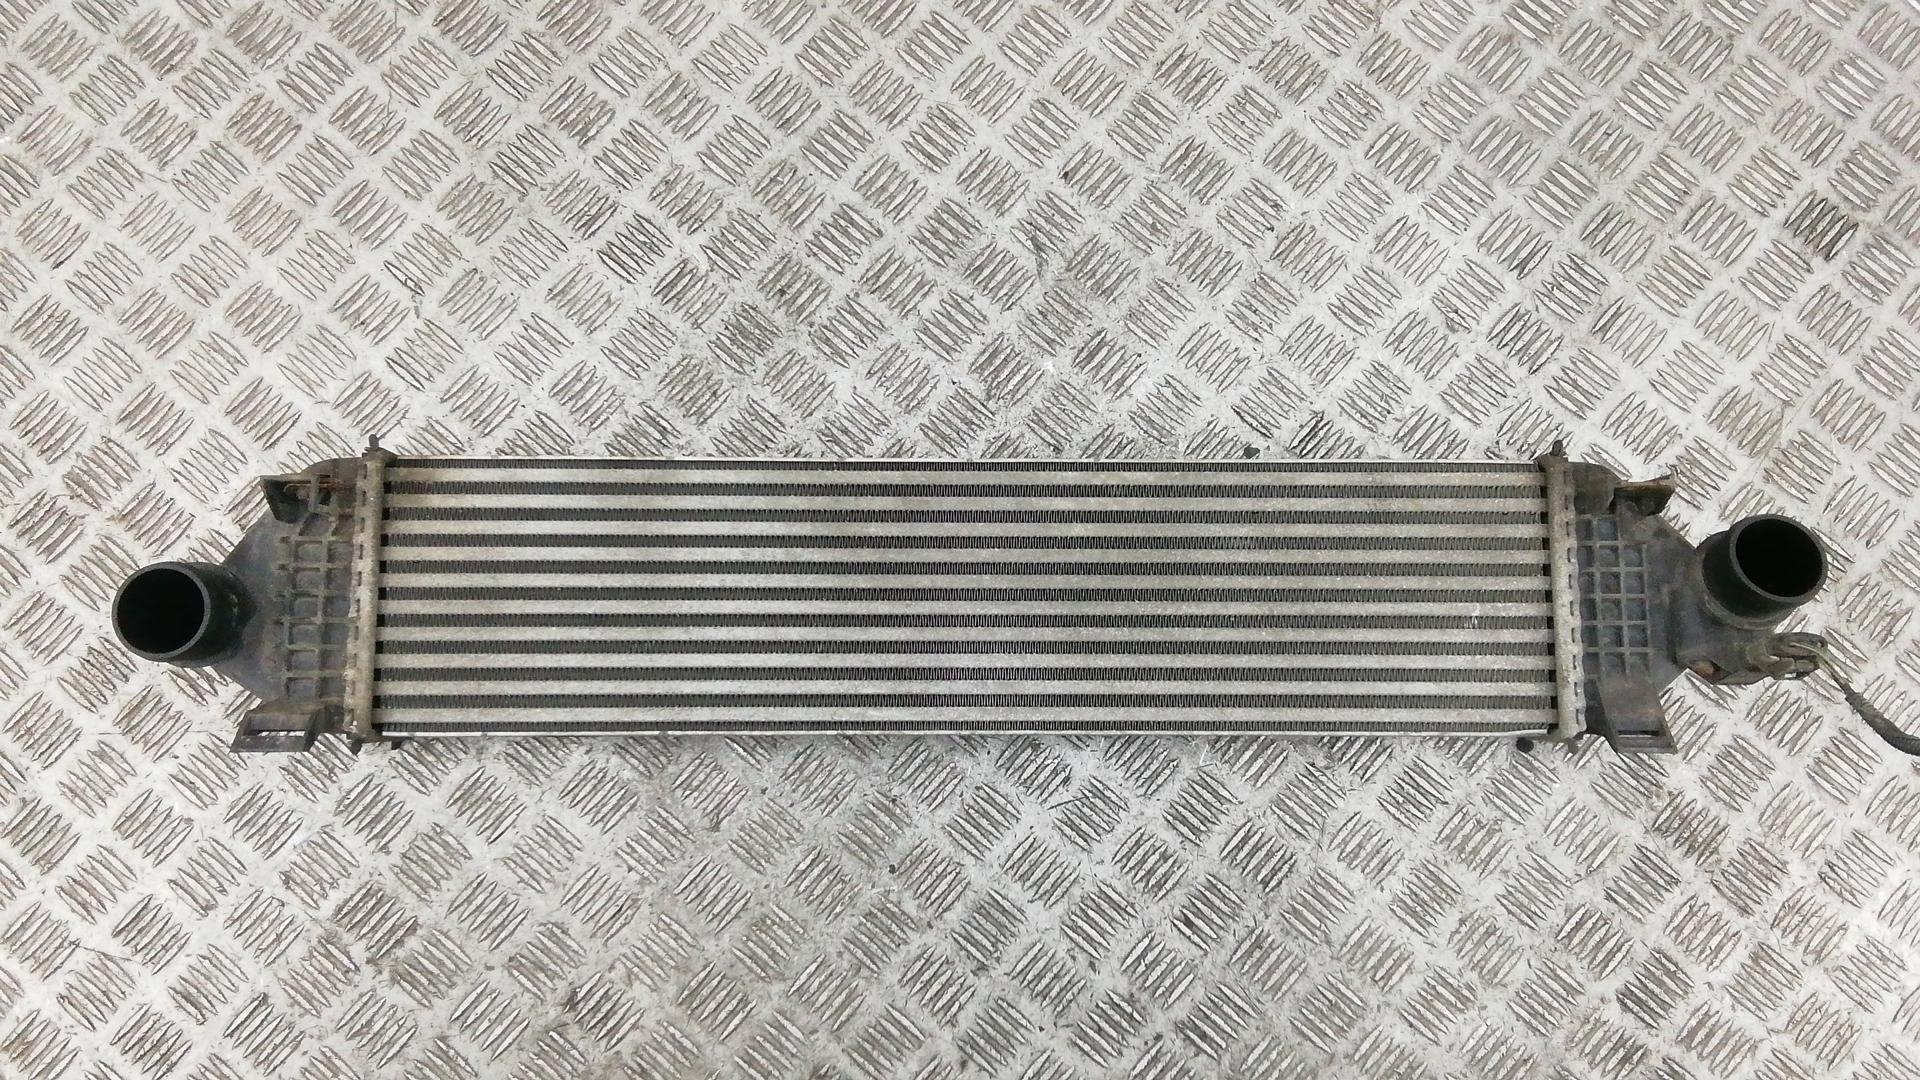 Радиатор интеркуллера, FORD, FOCUS 3, 2011